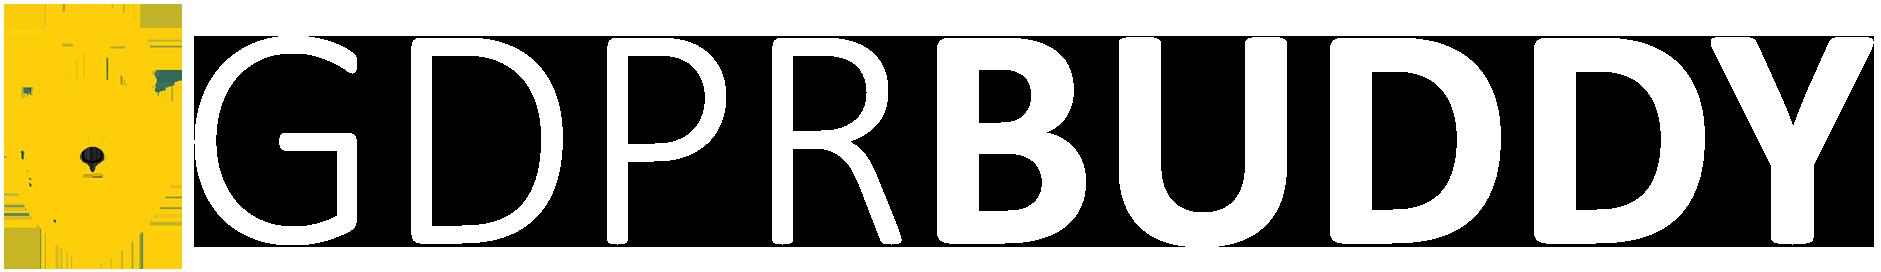 GDPR-Buddy